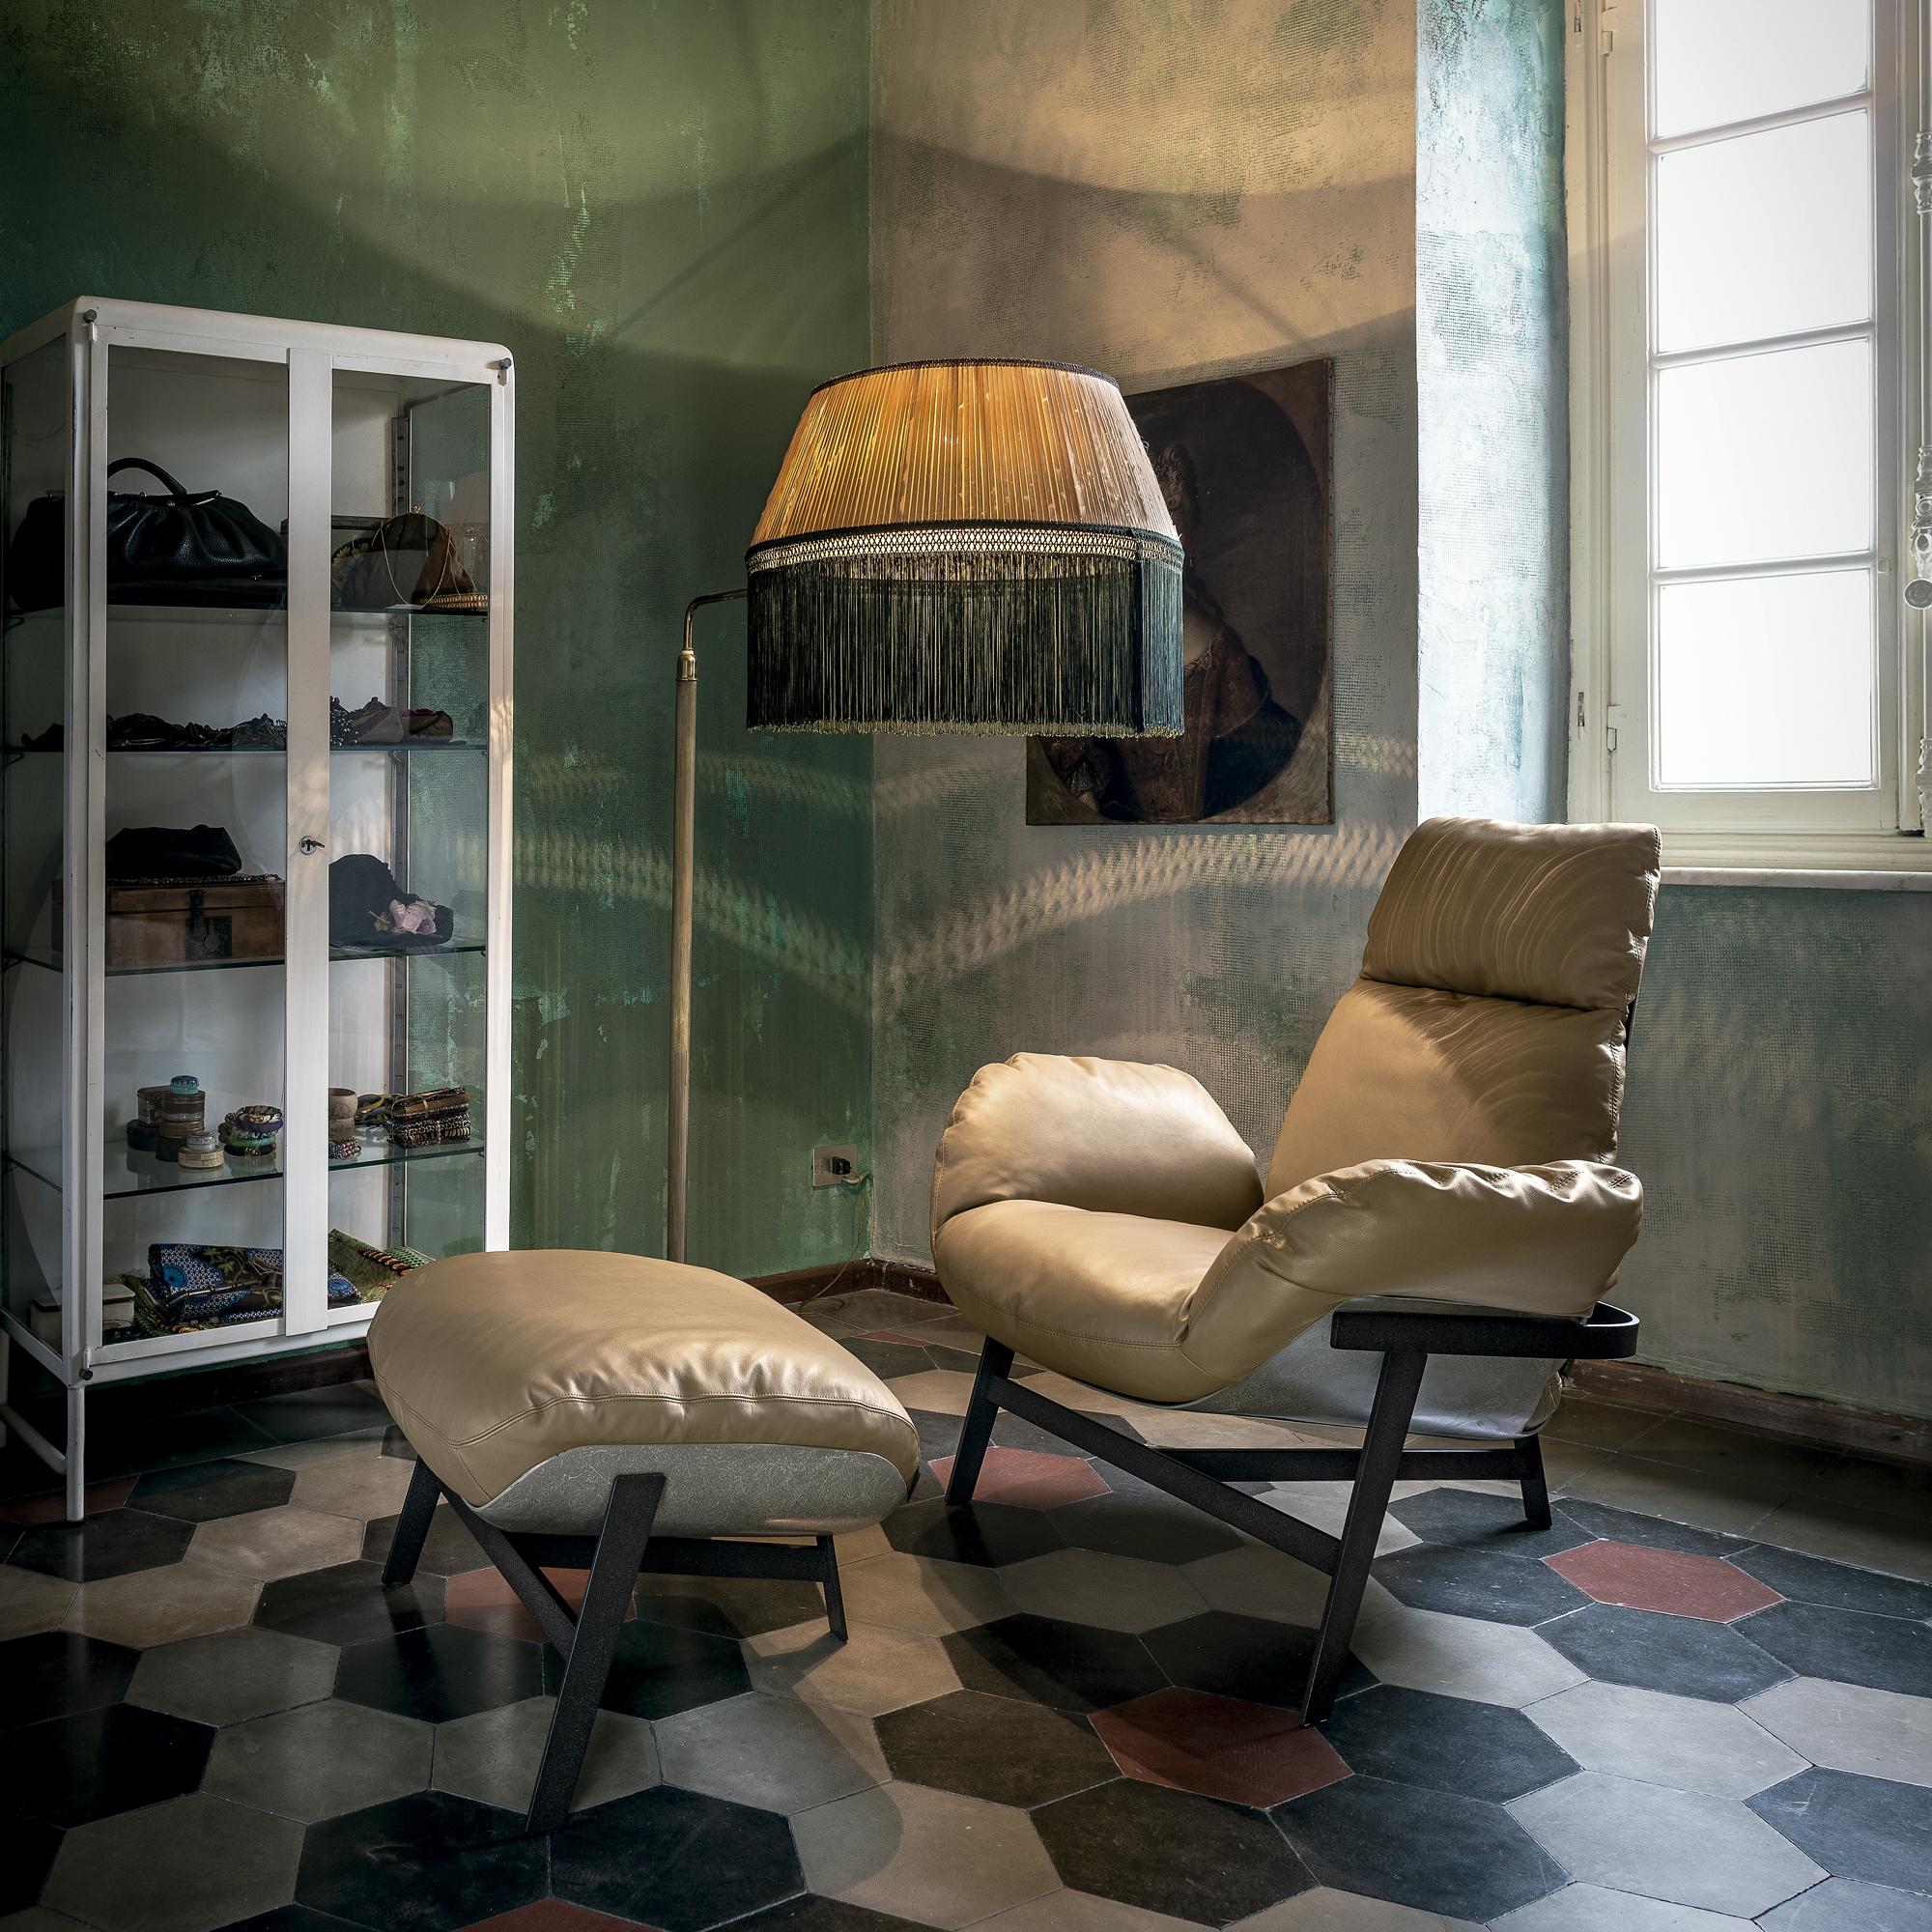 Jupiter High-end Contemporary Lounge Chair - Jupiter